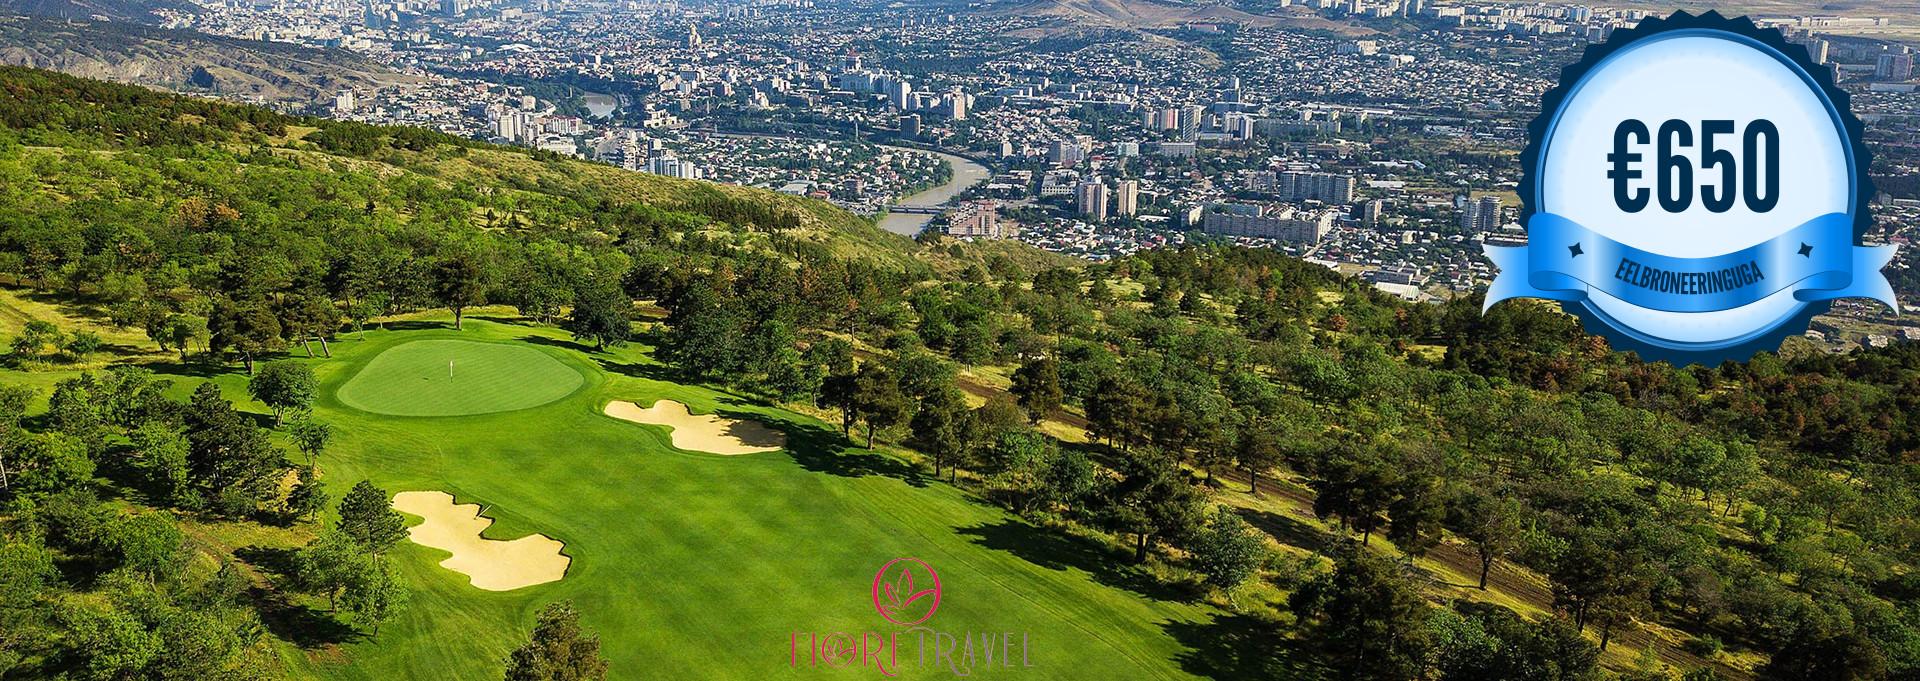 Tbilisi Hills